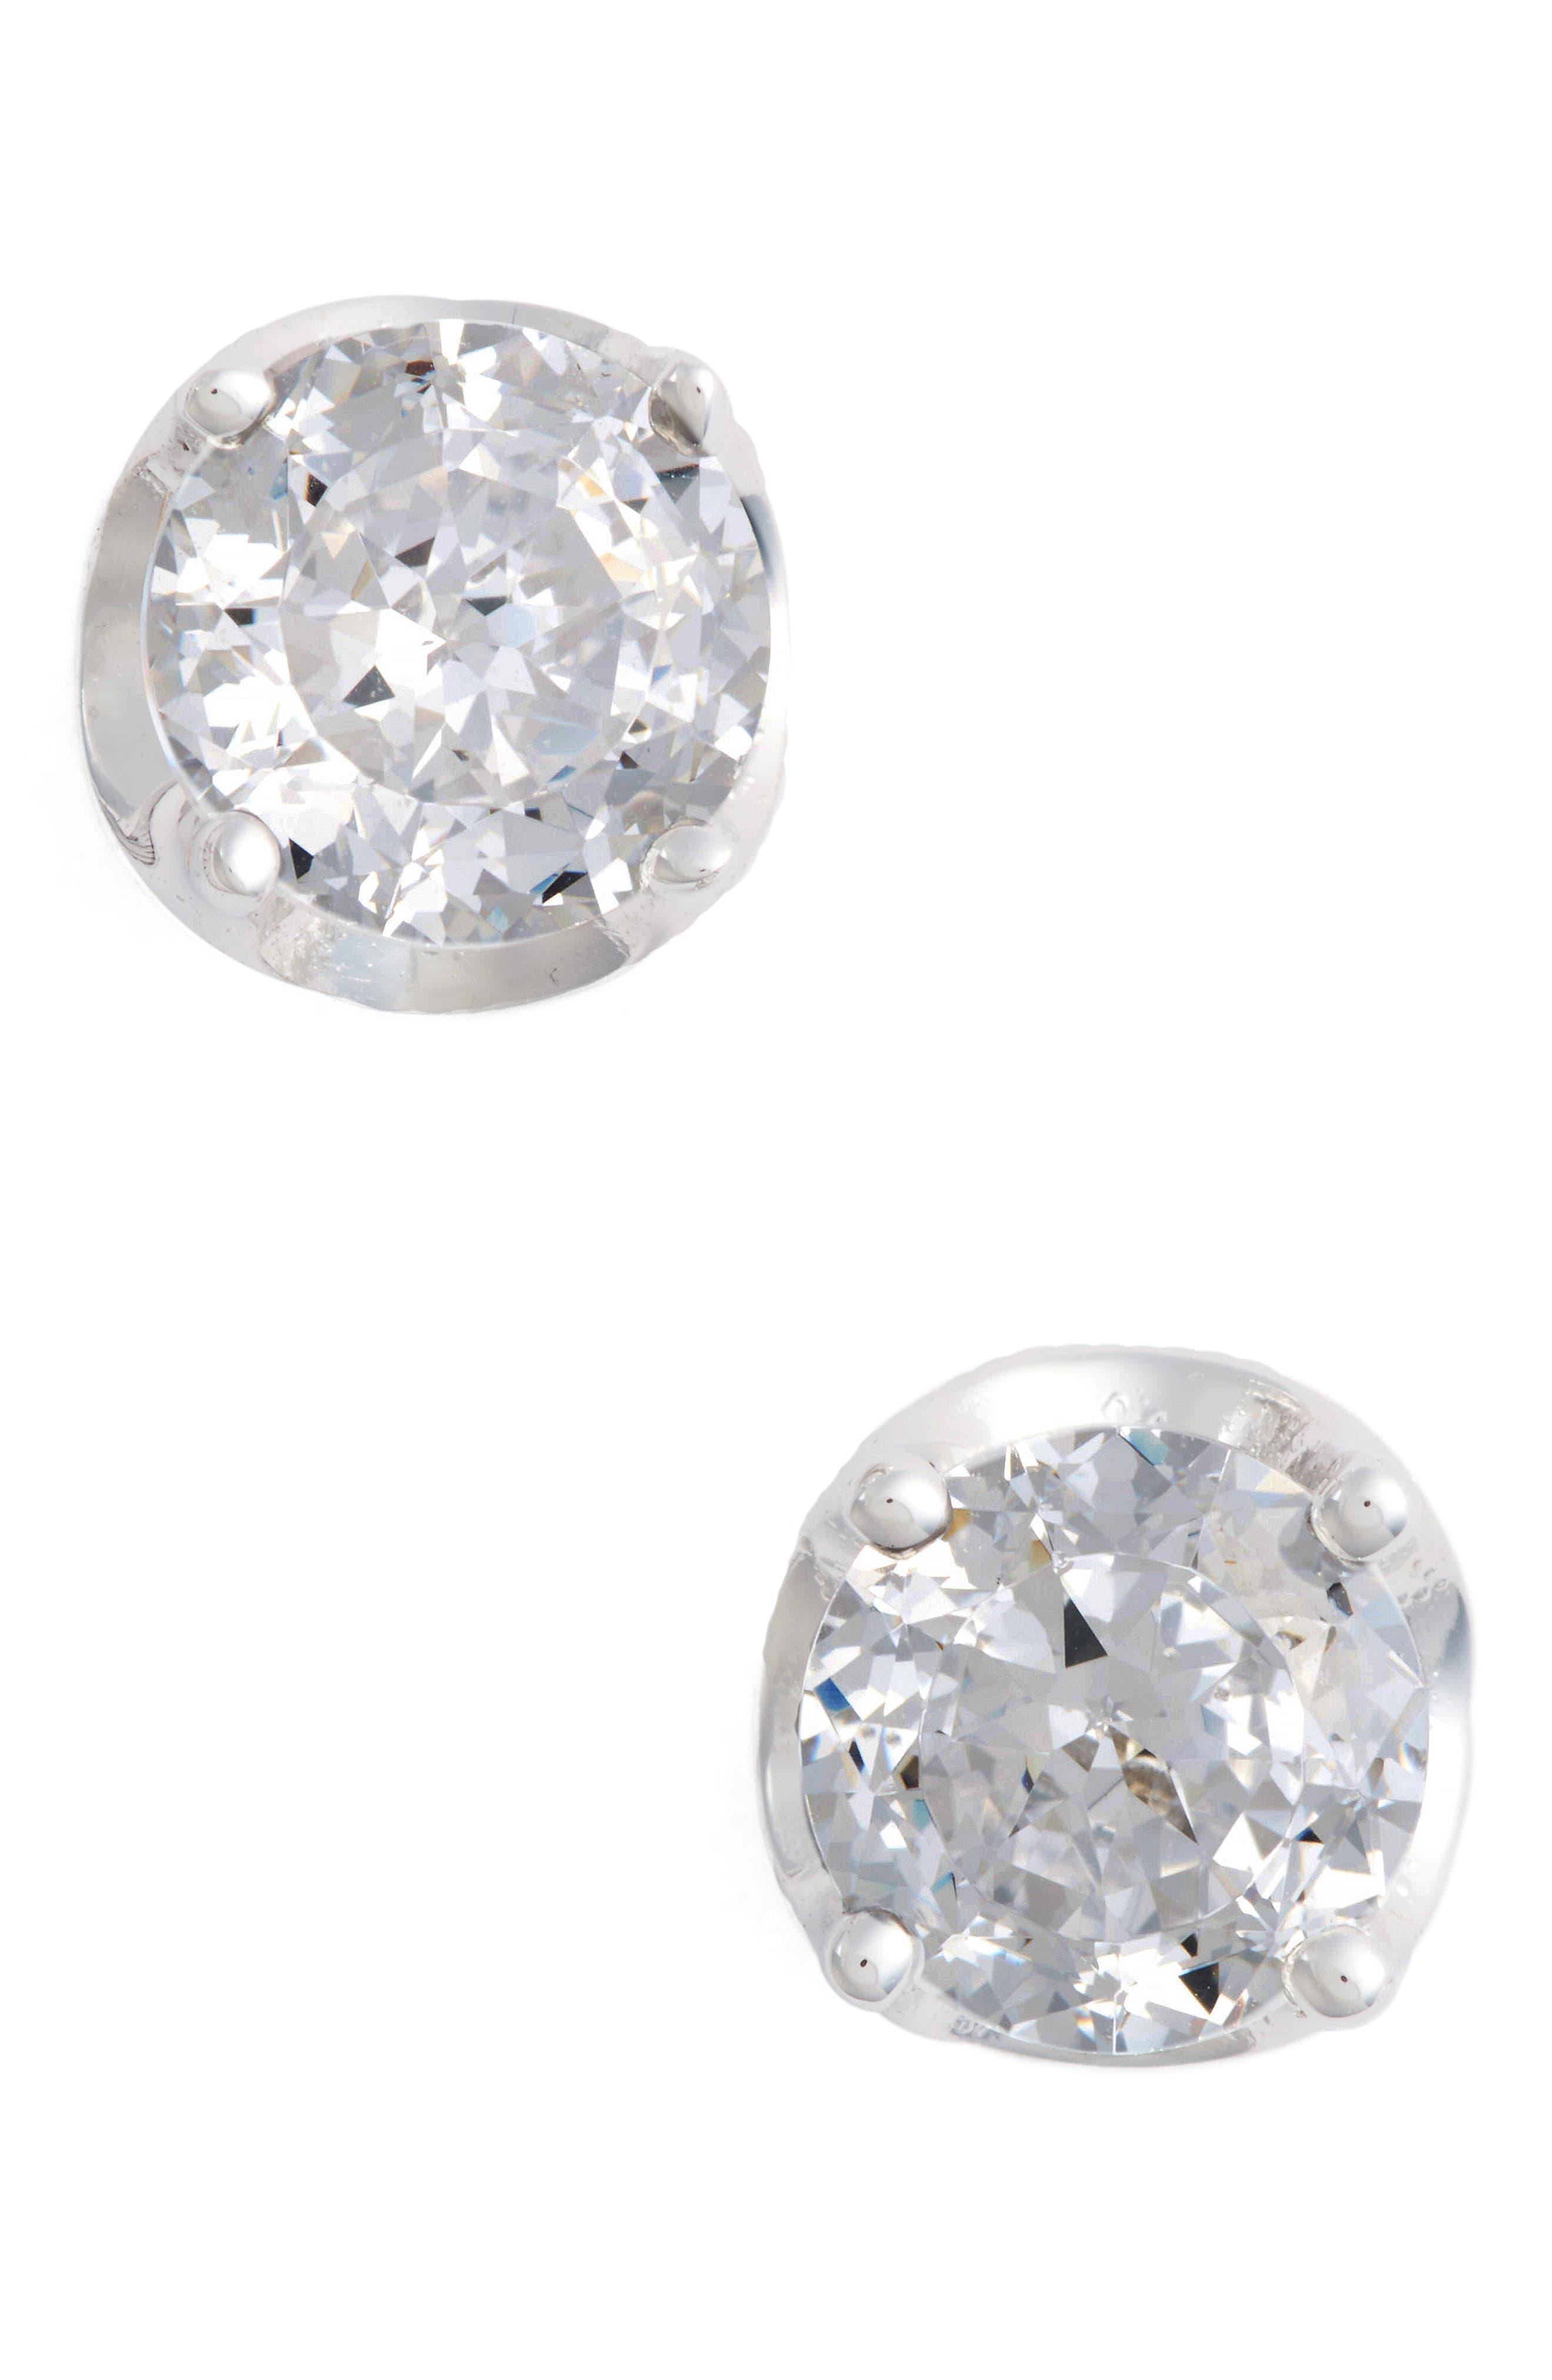 Simulated Diamond Stud Earrings,                             Main thumbnail 1, color,                             100